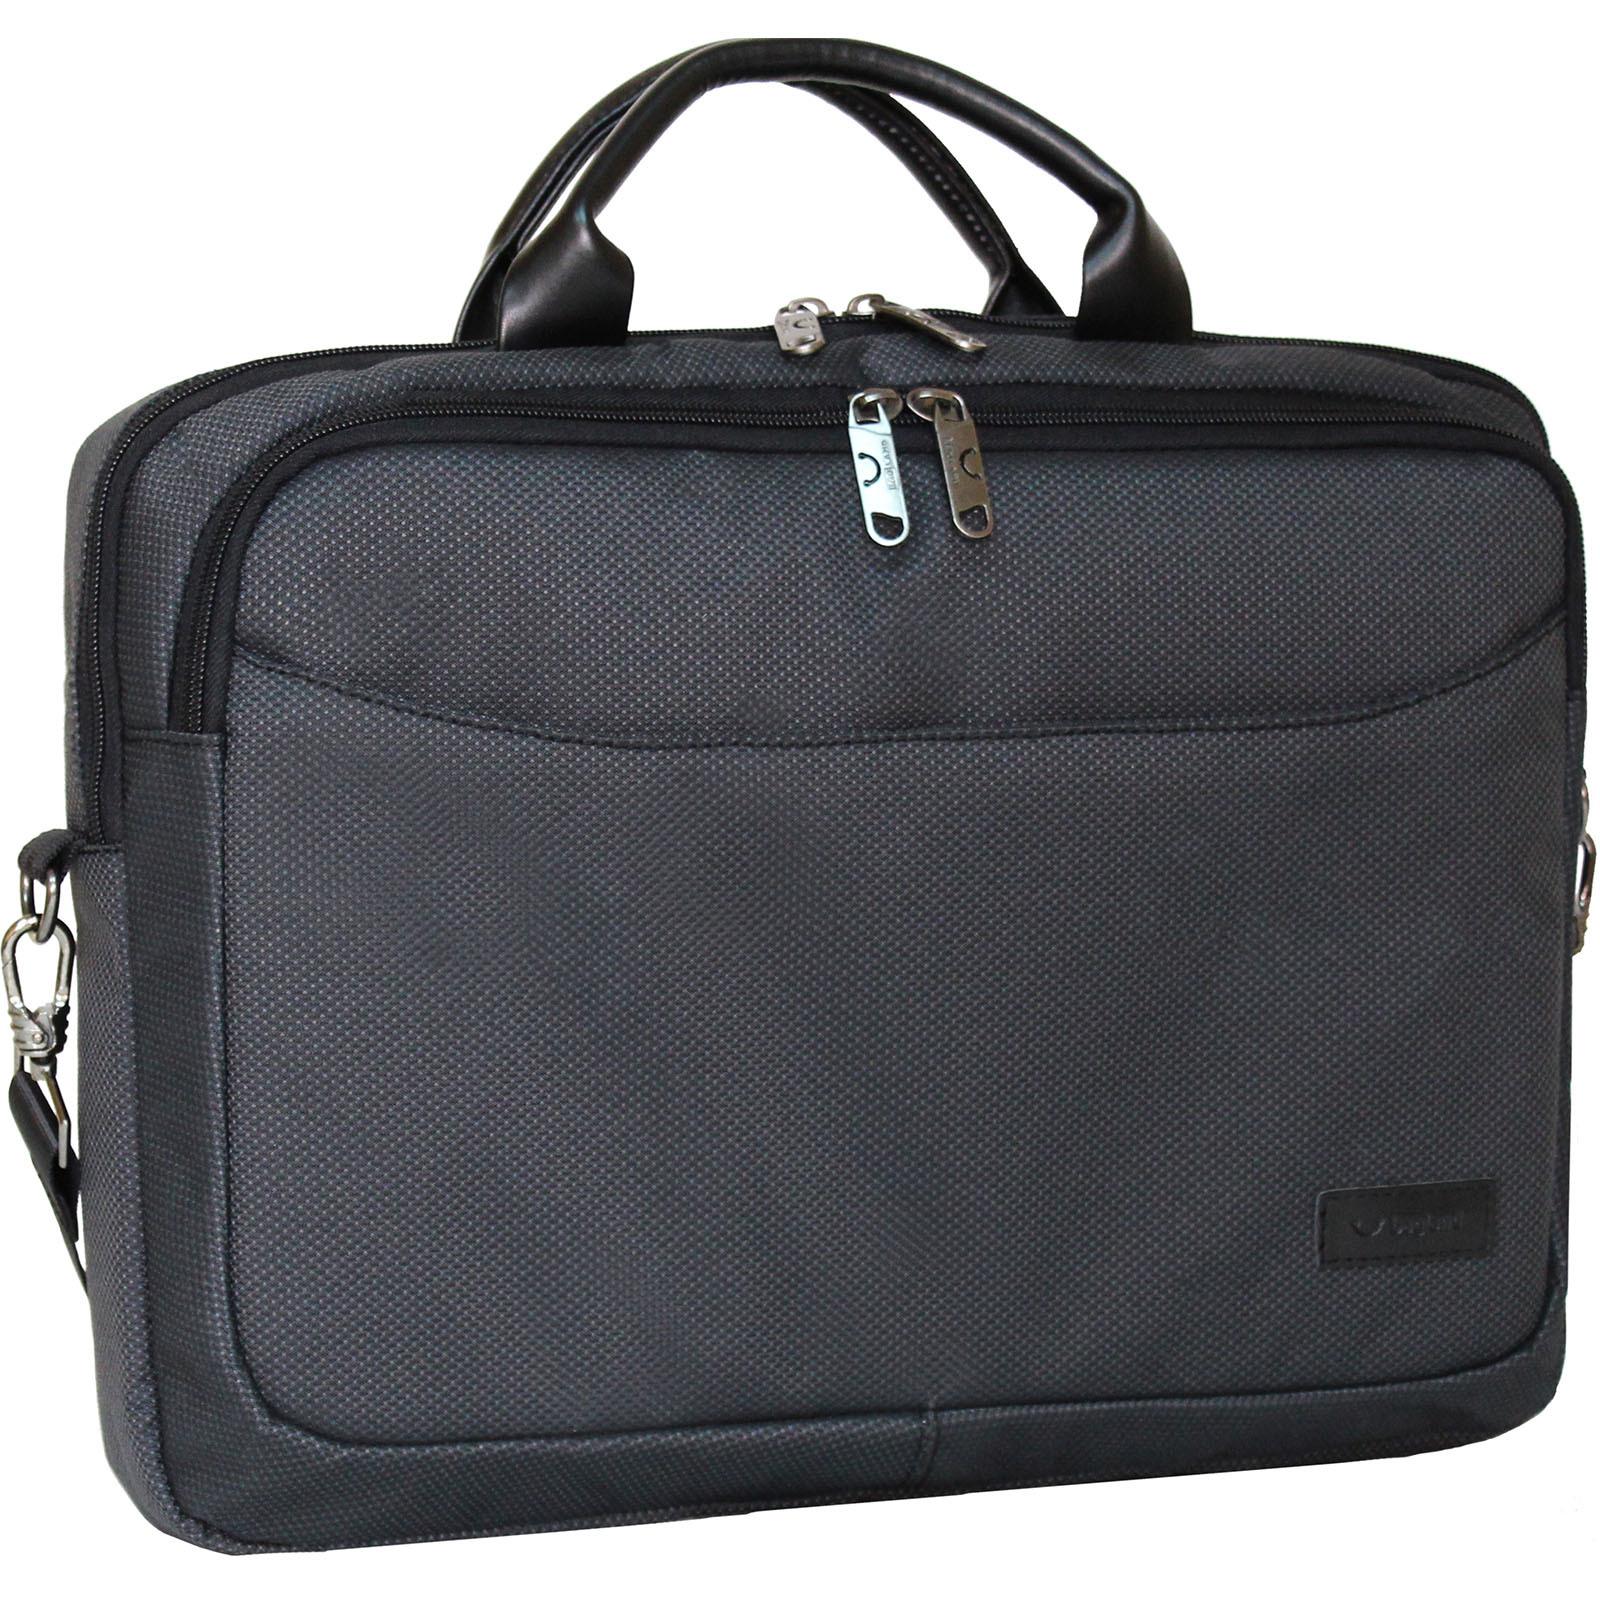 Сумки для ноутбука Сумка для ноутбука Bagland Fremont 11 л. Чёрный (00427169) IMG_1874.JPG